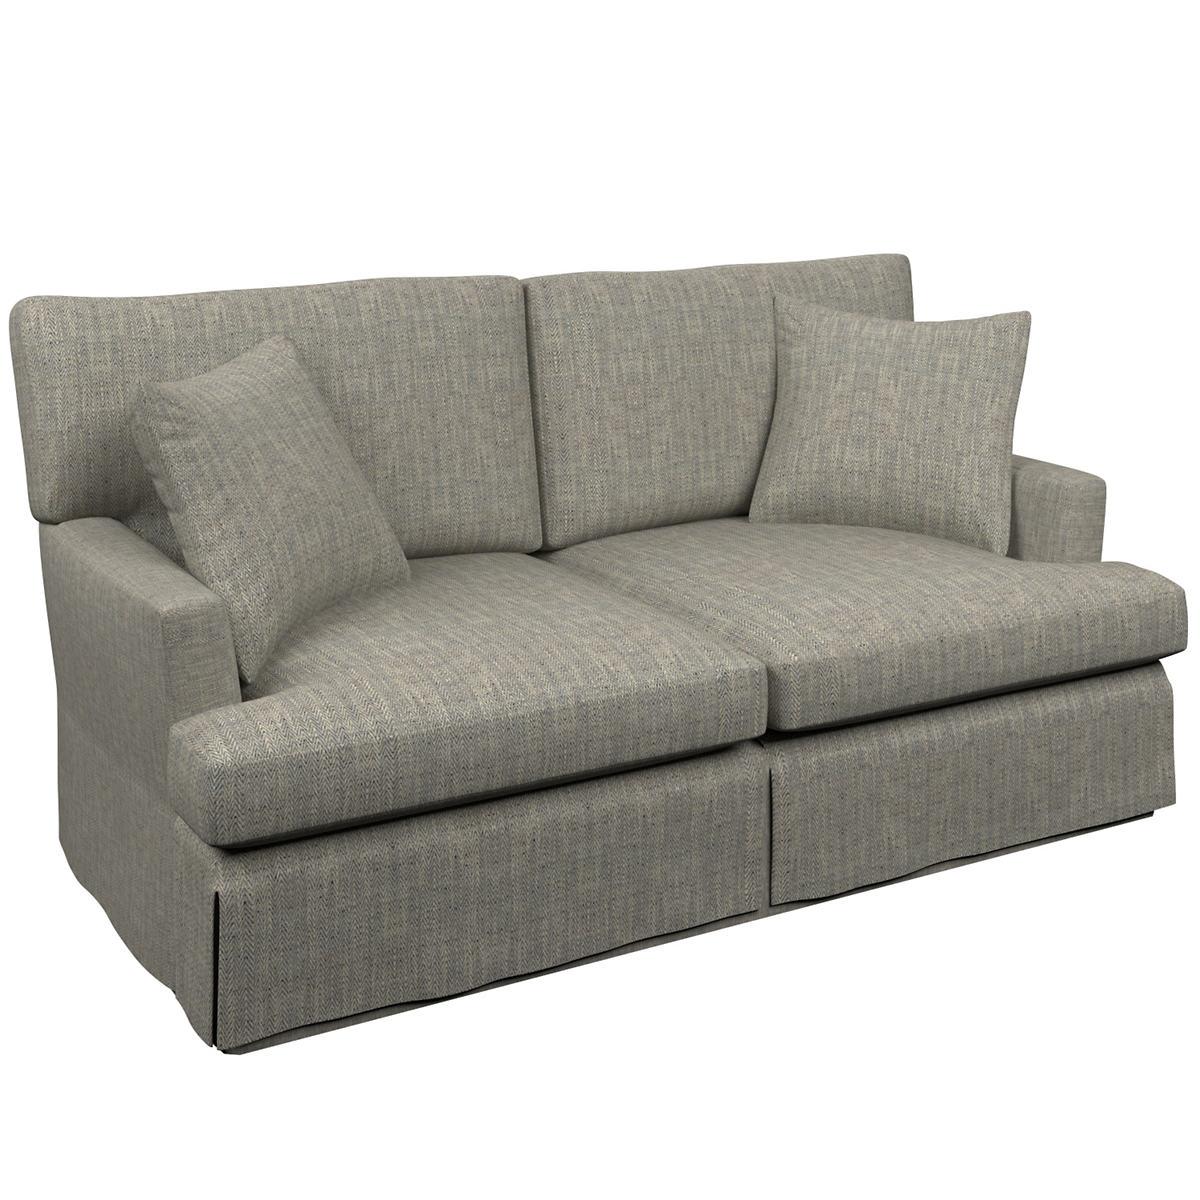 Chevron Indigo Saybrook 2 Seater Slipcovered Sofa